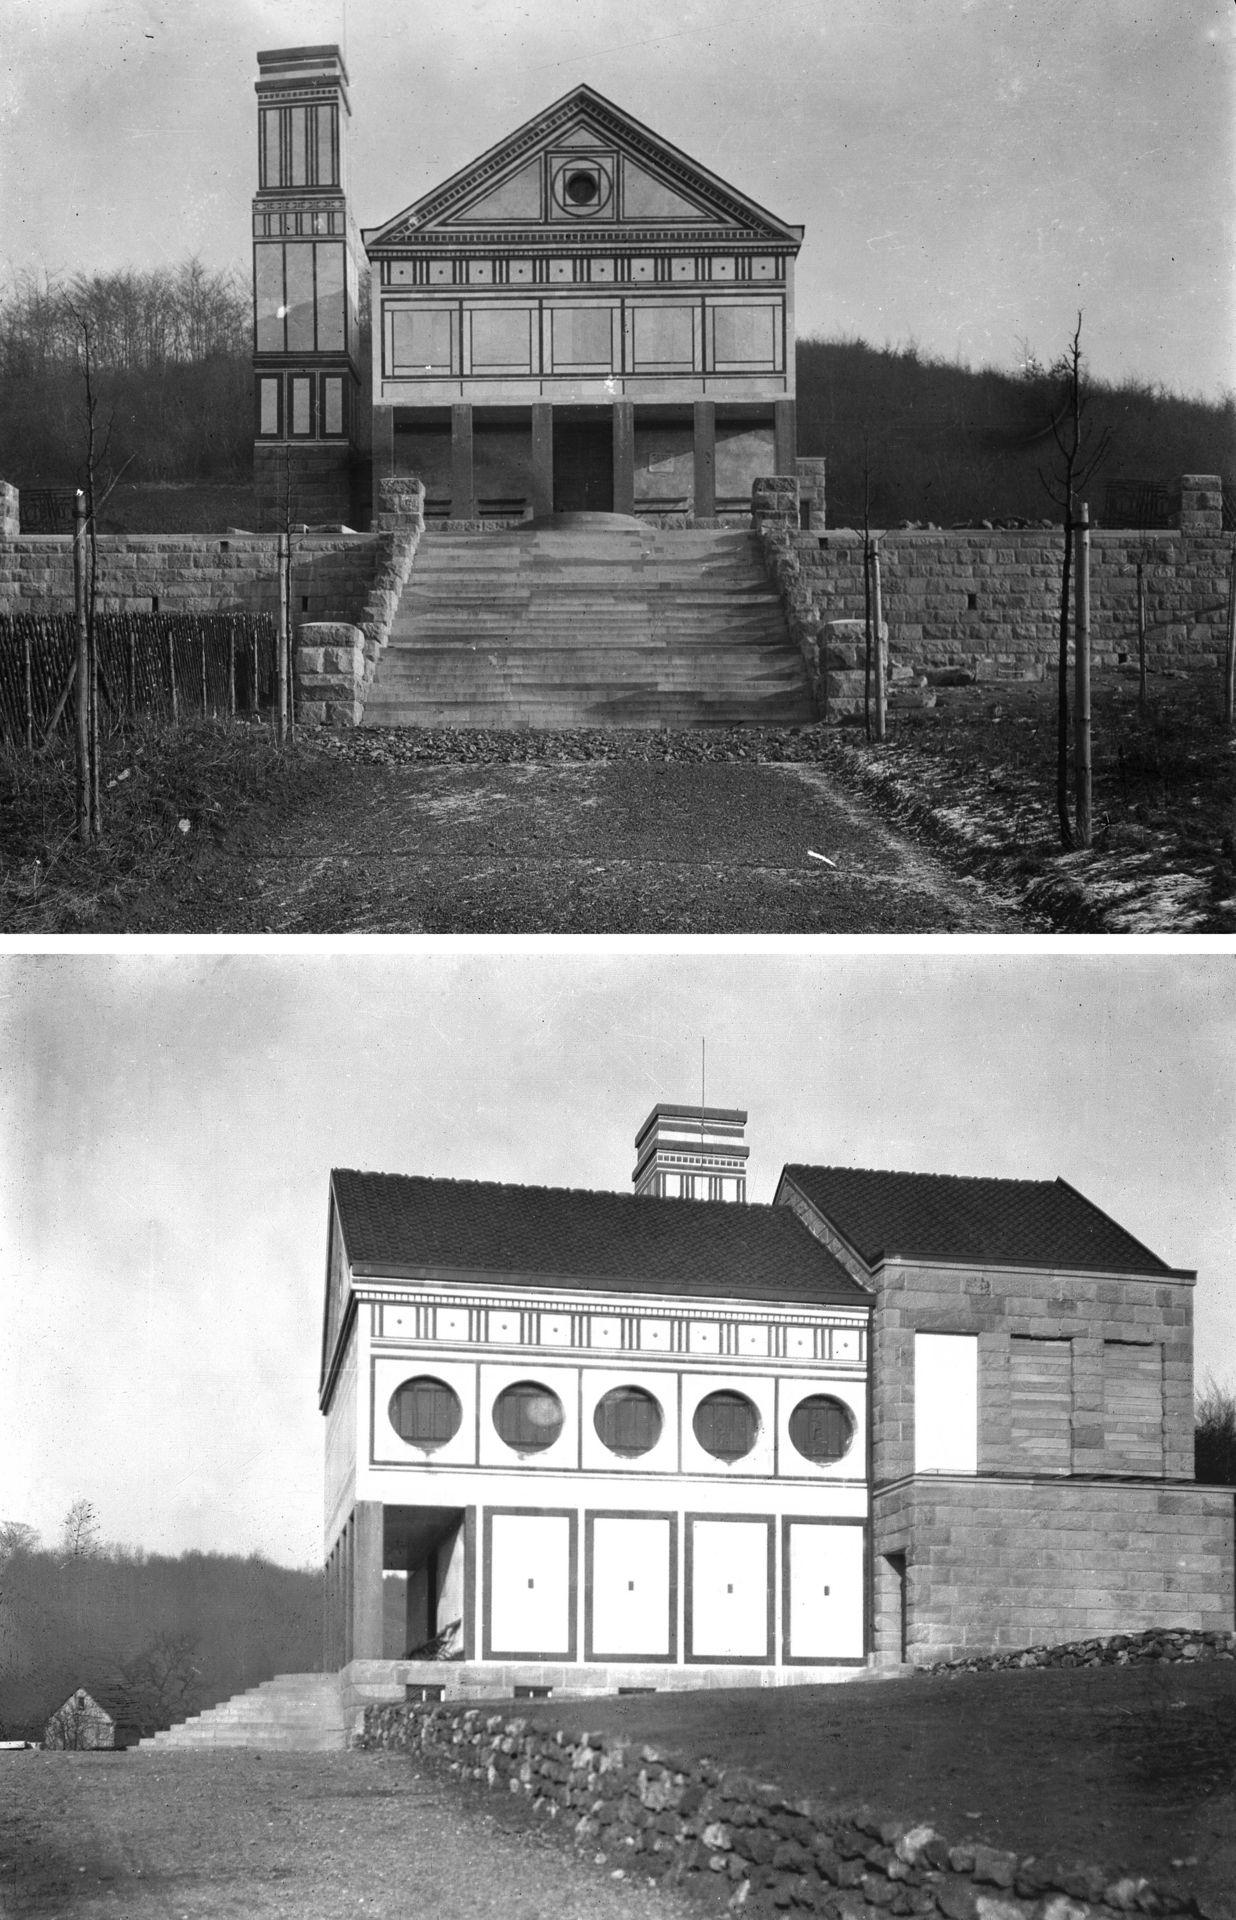 Peter behrens 1906 1907 1 pinterest architecture for Behrens house